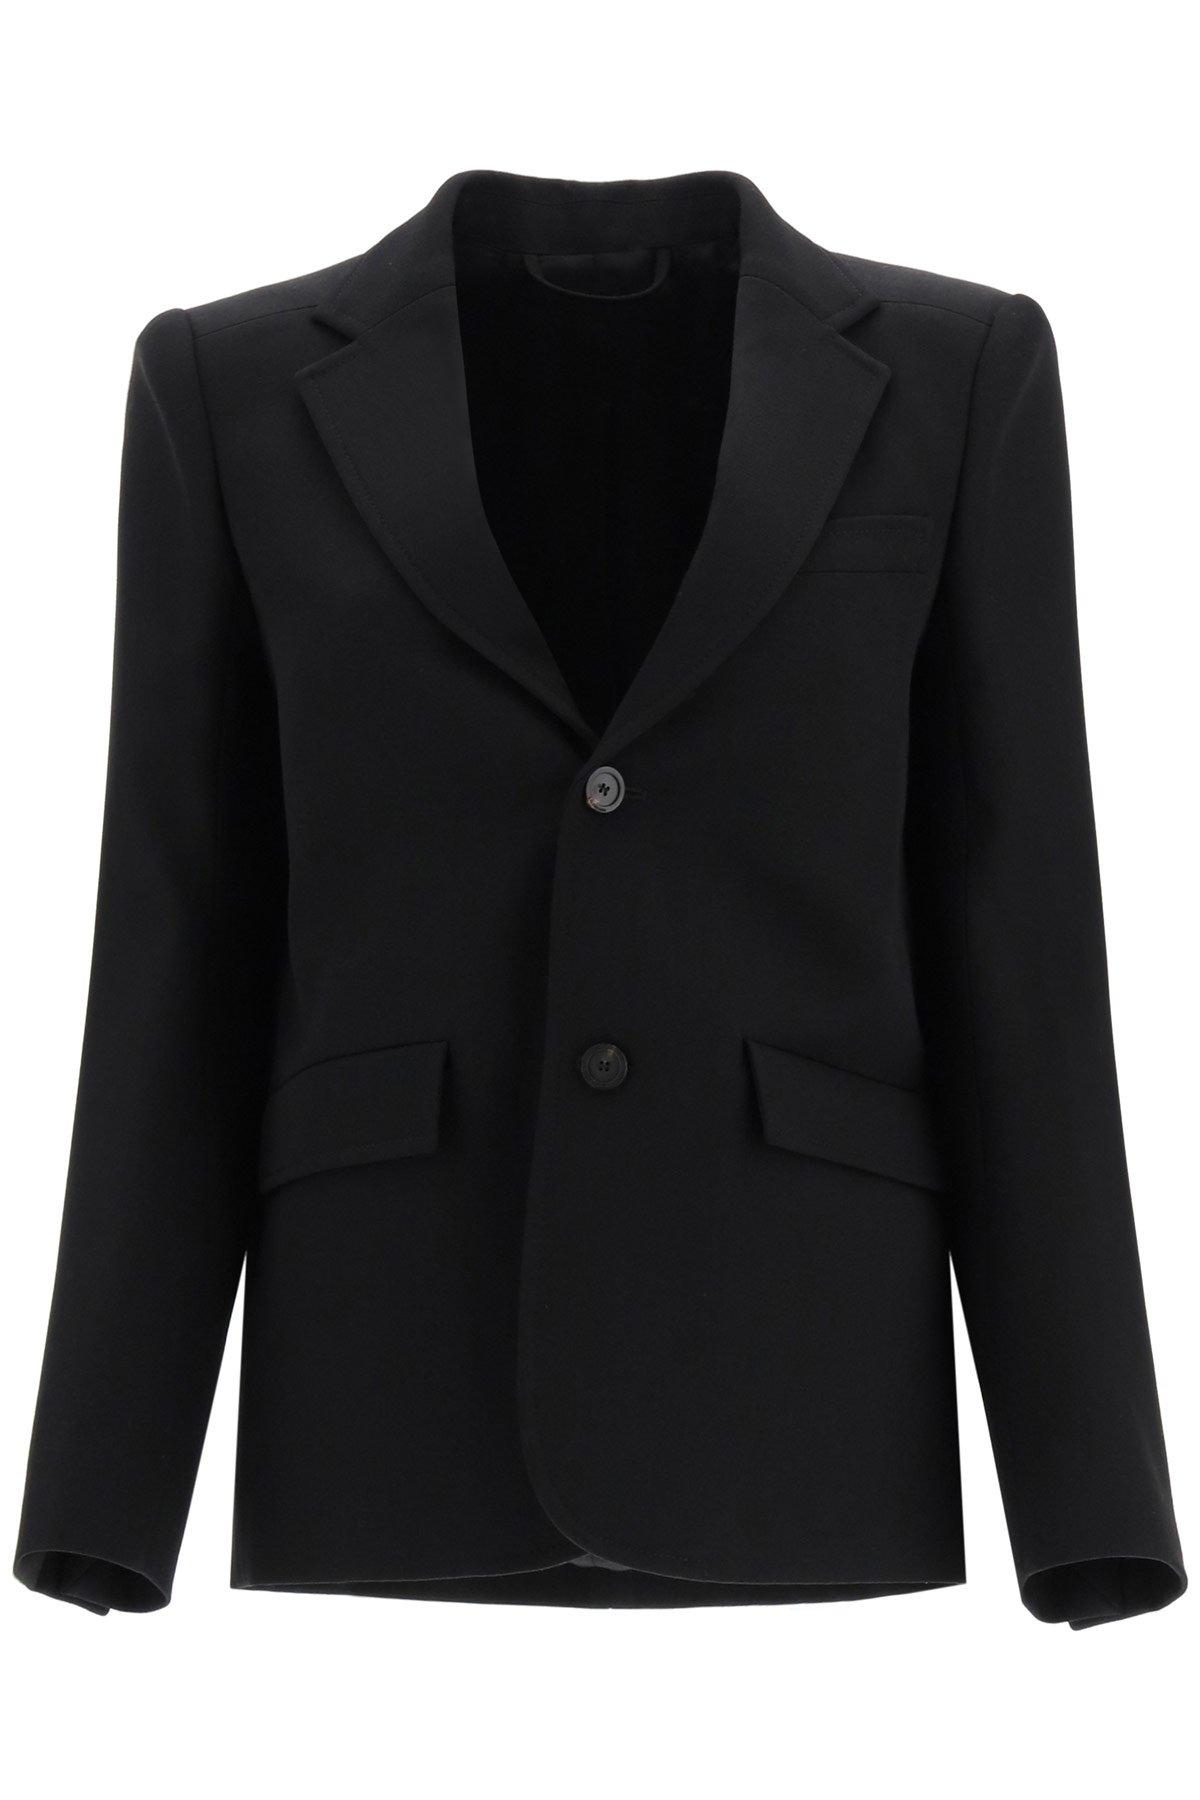 Balenciaga blazer curved shoulder